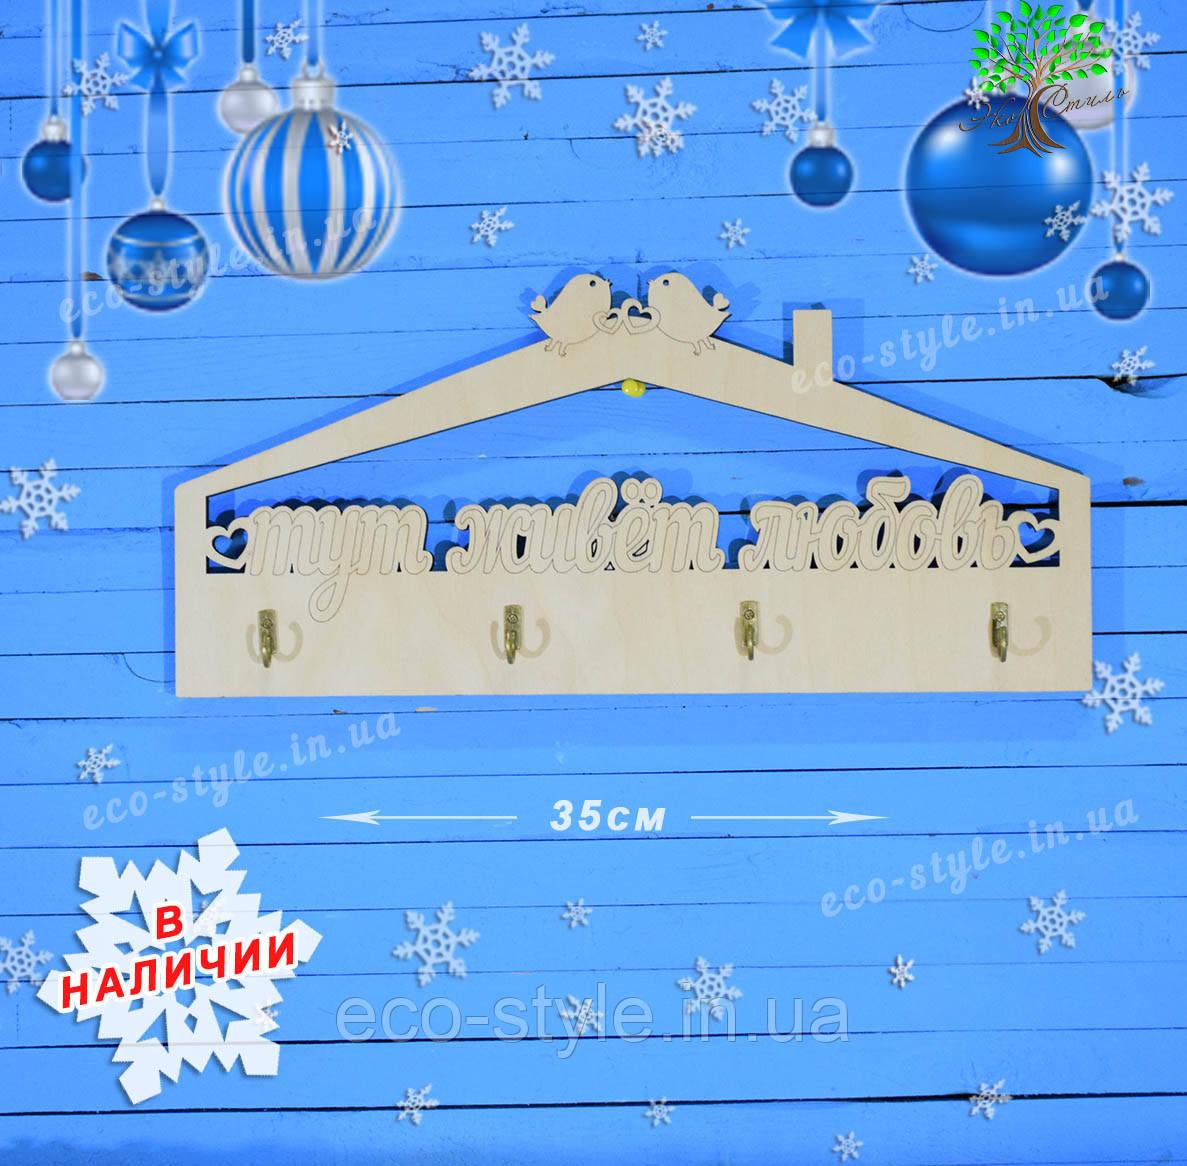 Ключница, вешалка для ключей, новогодний подарок